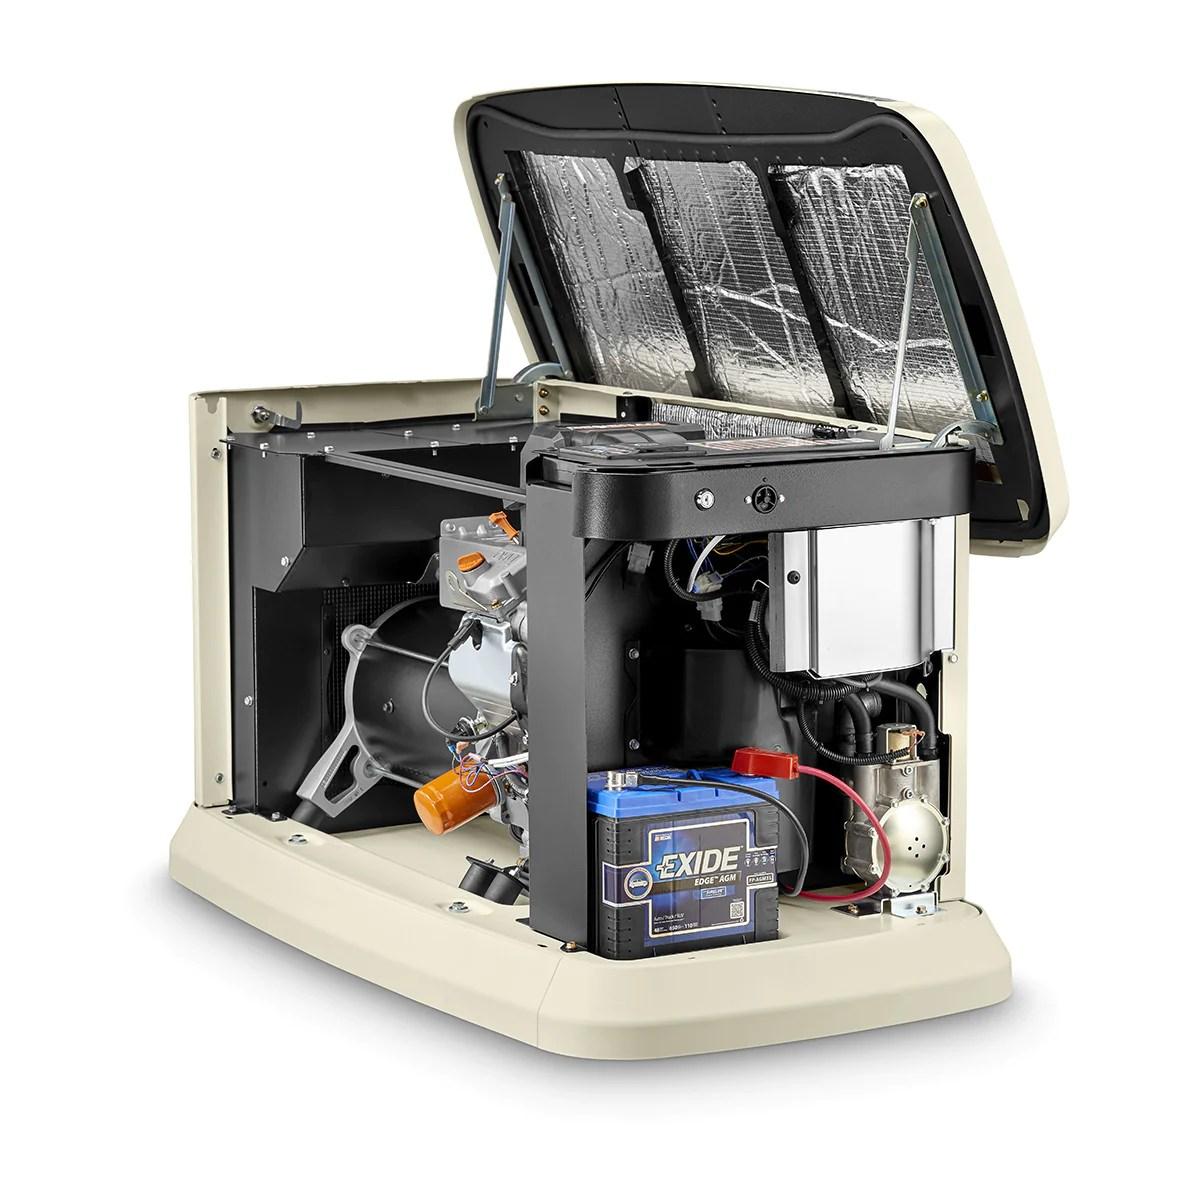 generac 20kw generator wiring diagram 2003 honda civic fuse box guardian 7038 aluminum automatic standby